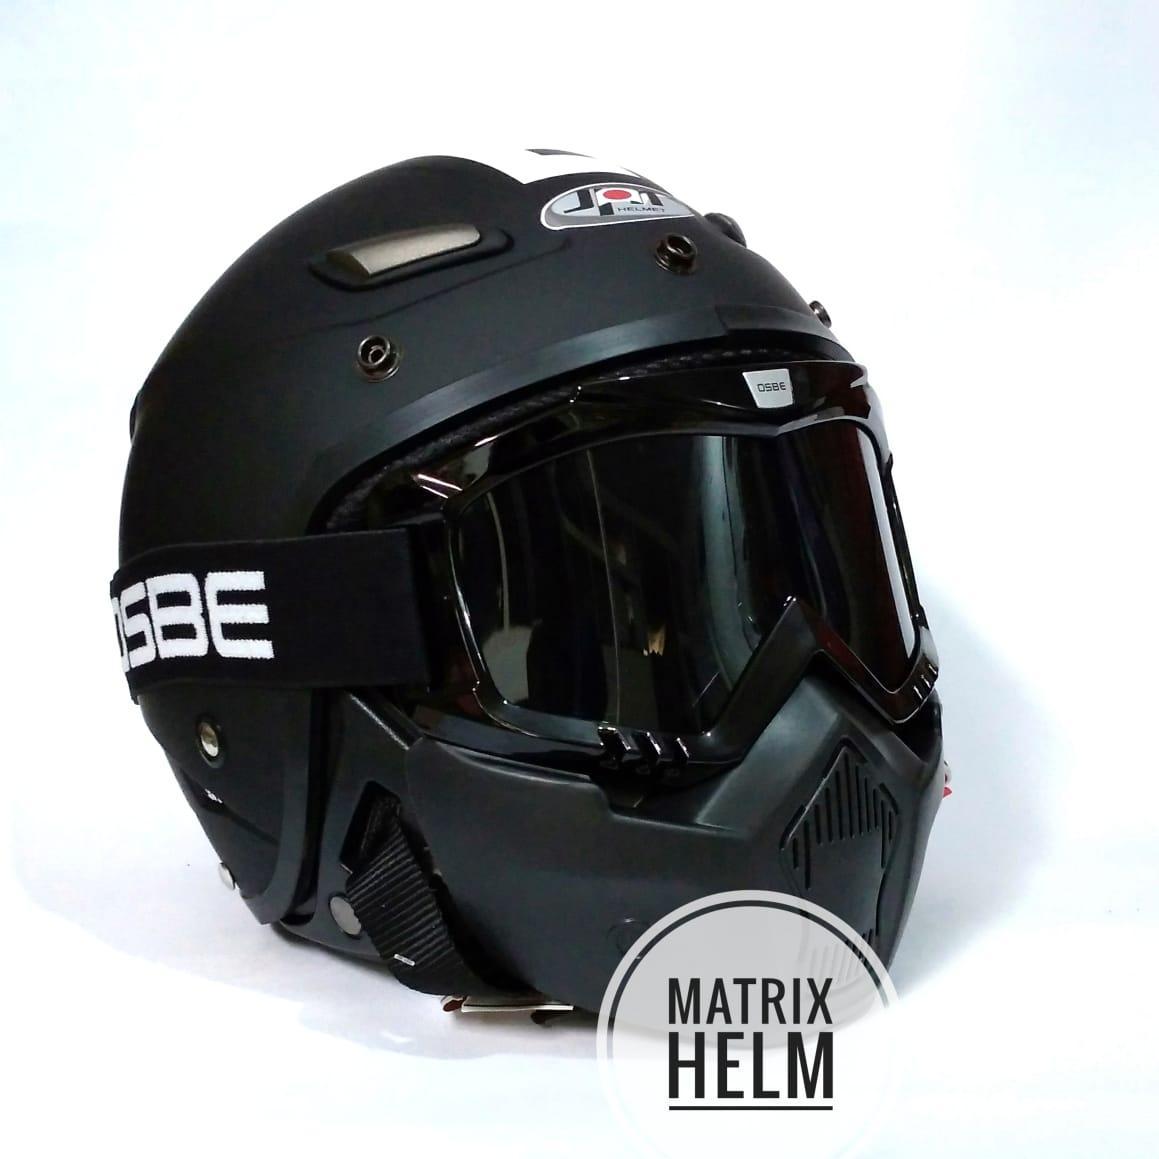 Helm Berkendara Motor Semi Cross Half Face Double Visor Hitam Doff Polos Matrixhelm Retro Dewasa Jpn Momo Dof Plus Goggle Mask Osbe